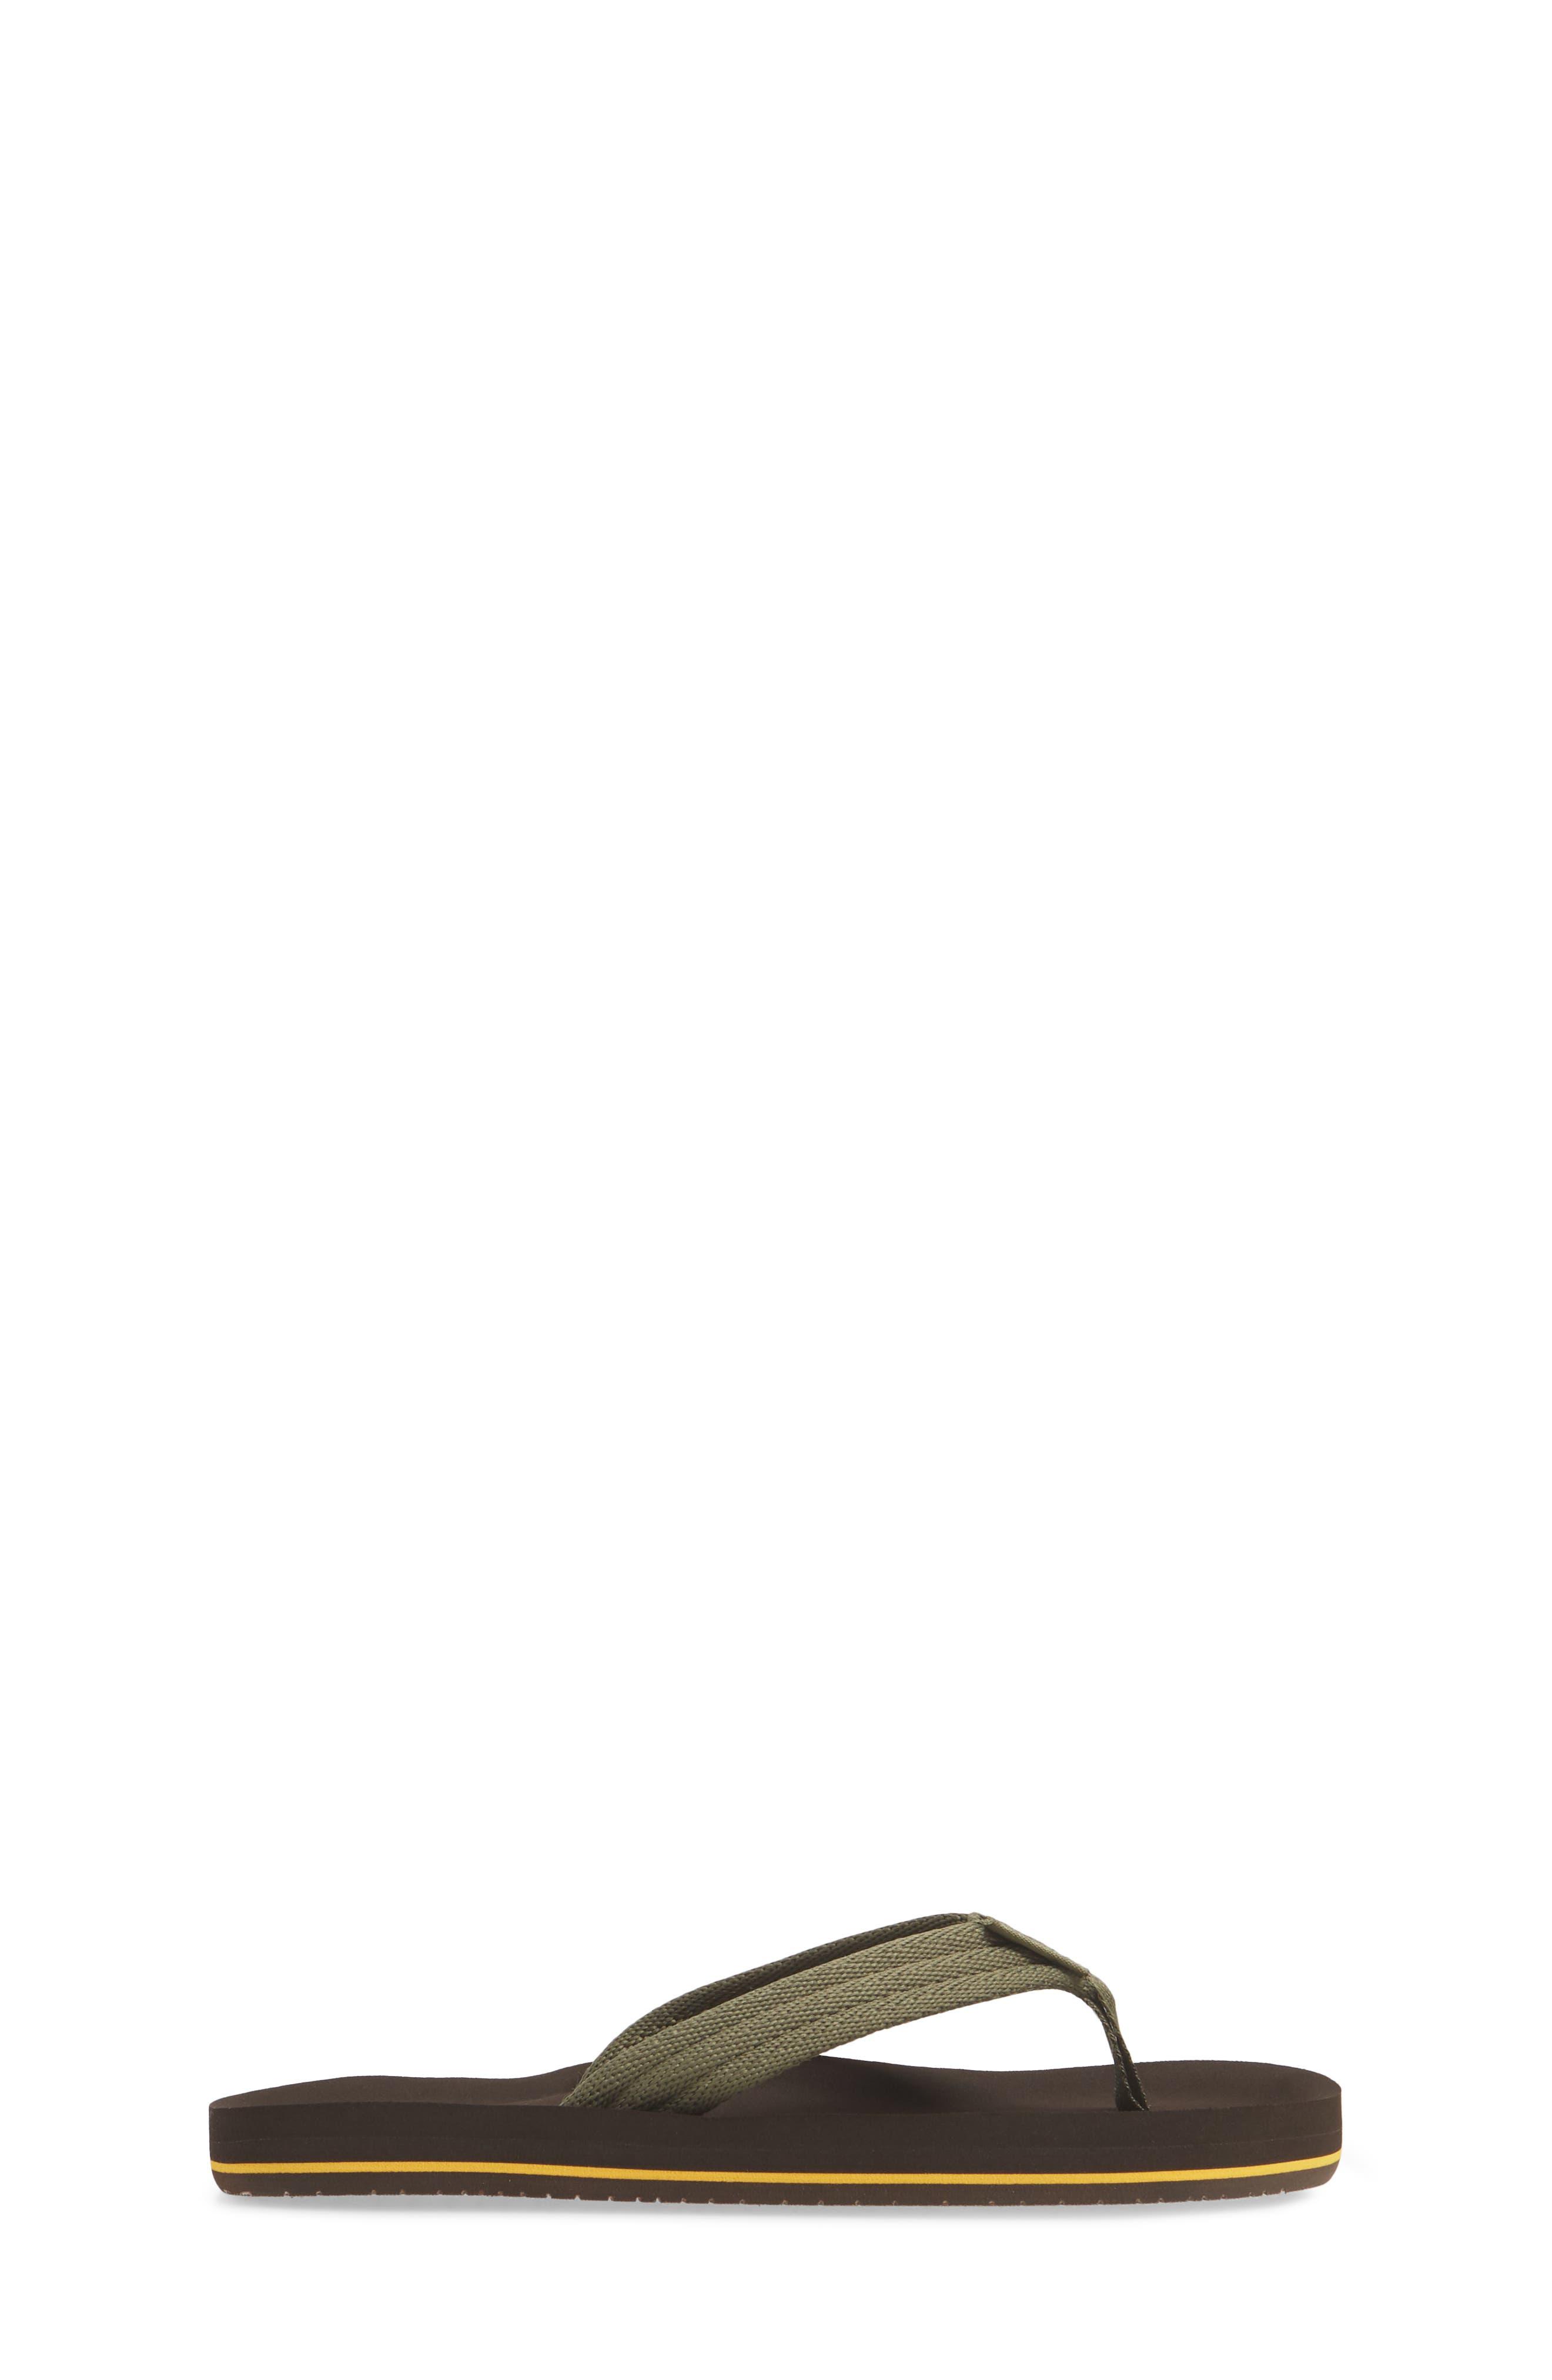 REEF, Ahi Beach Flip Flop, Alternate thumbnail 3, color, BROWN/ OLIVE